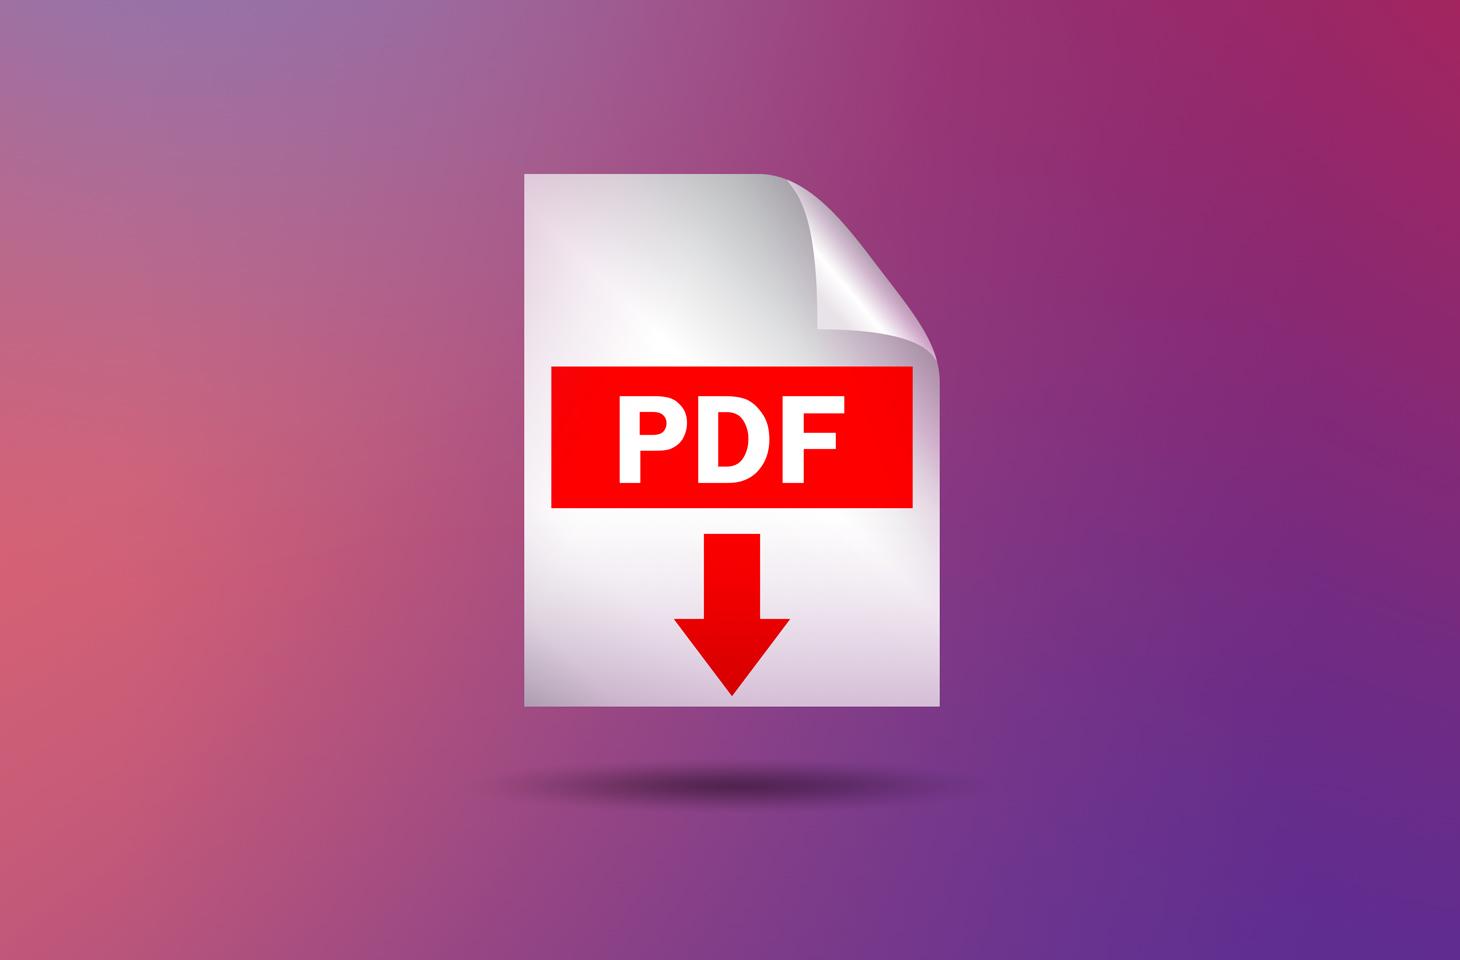 GoGoPDF Online PDF Tool: Understanding PDF Conversions Better